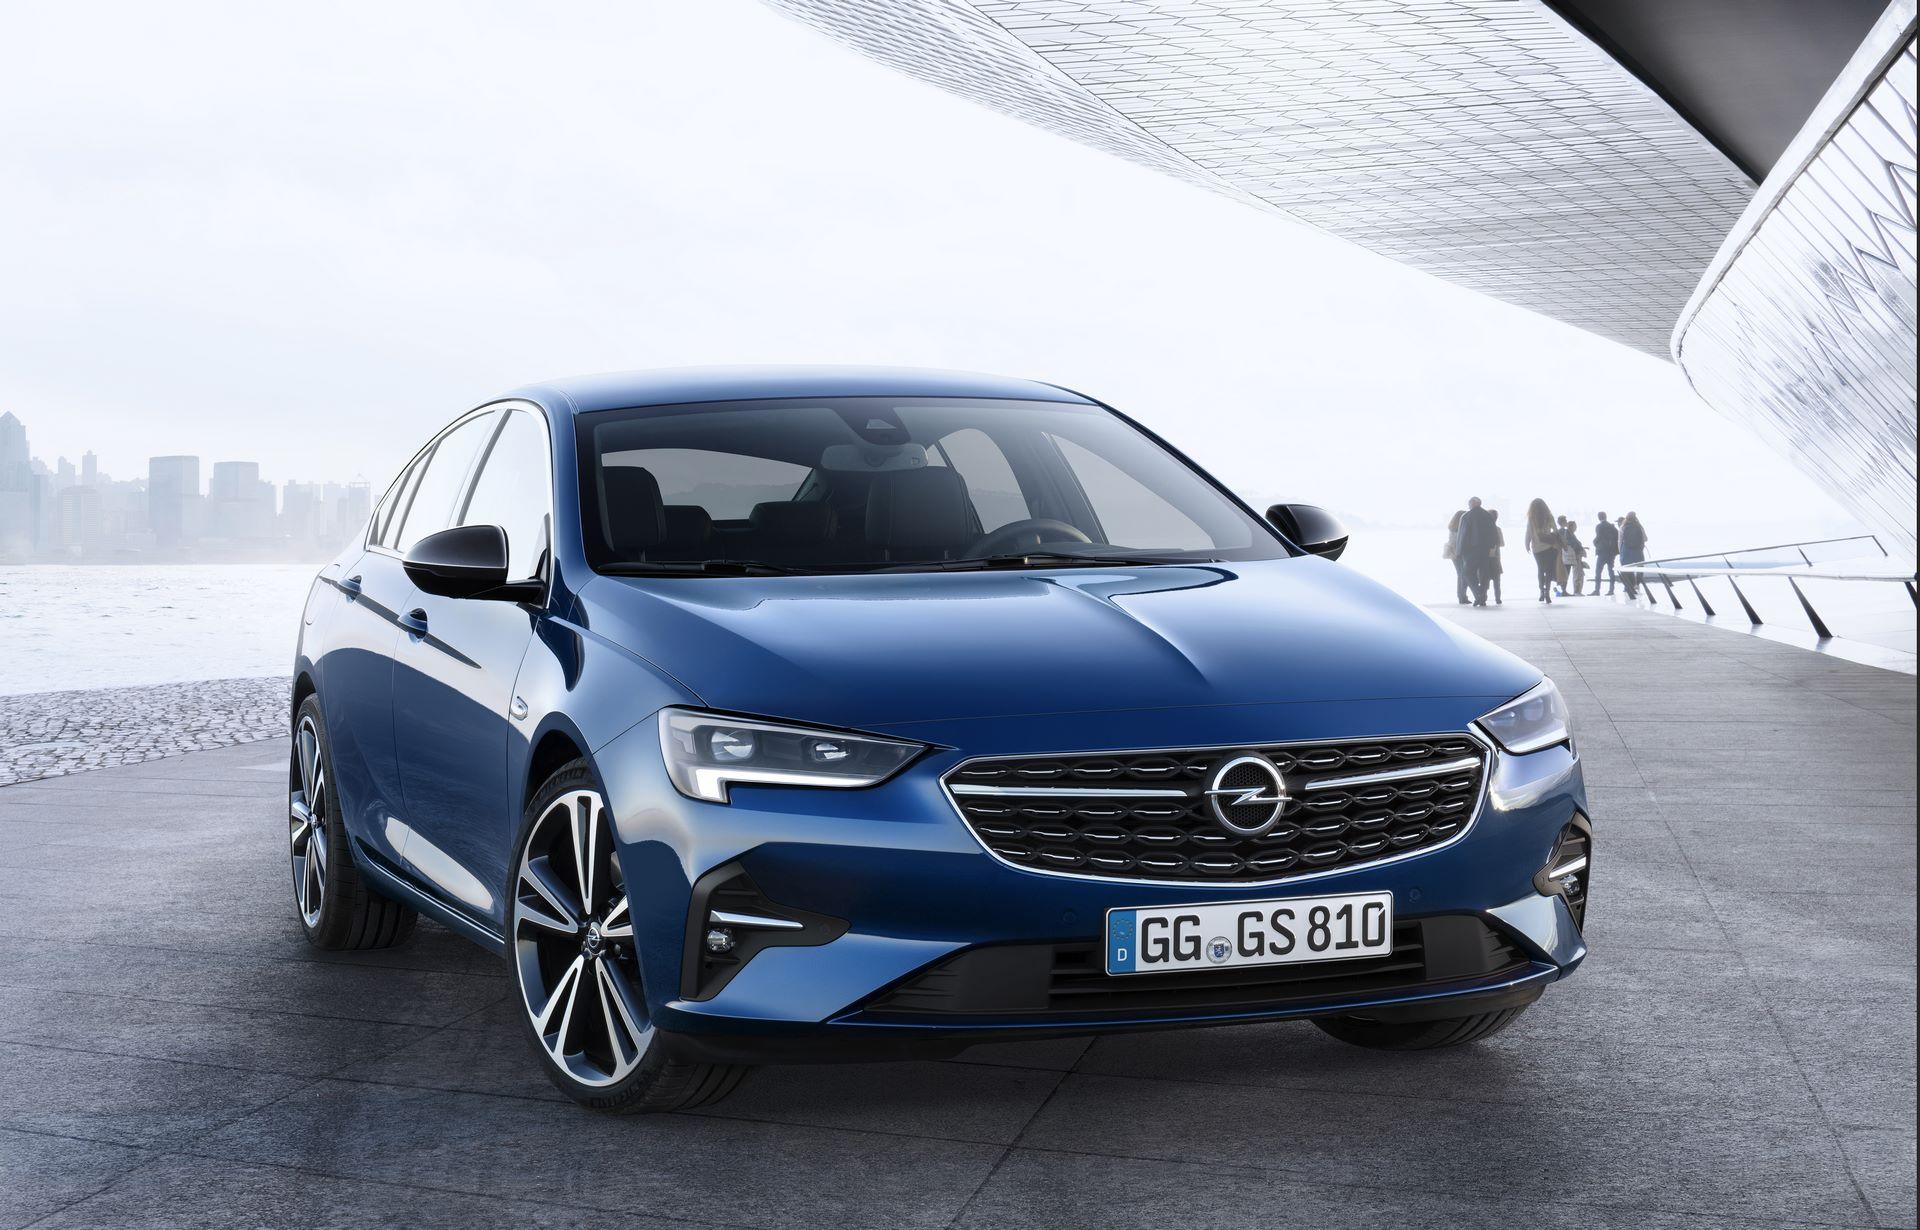 Opel-Insignia-facelift-2020-4